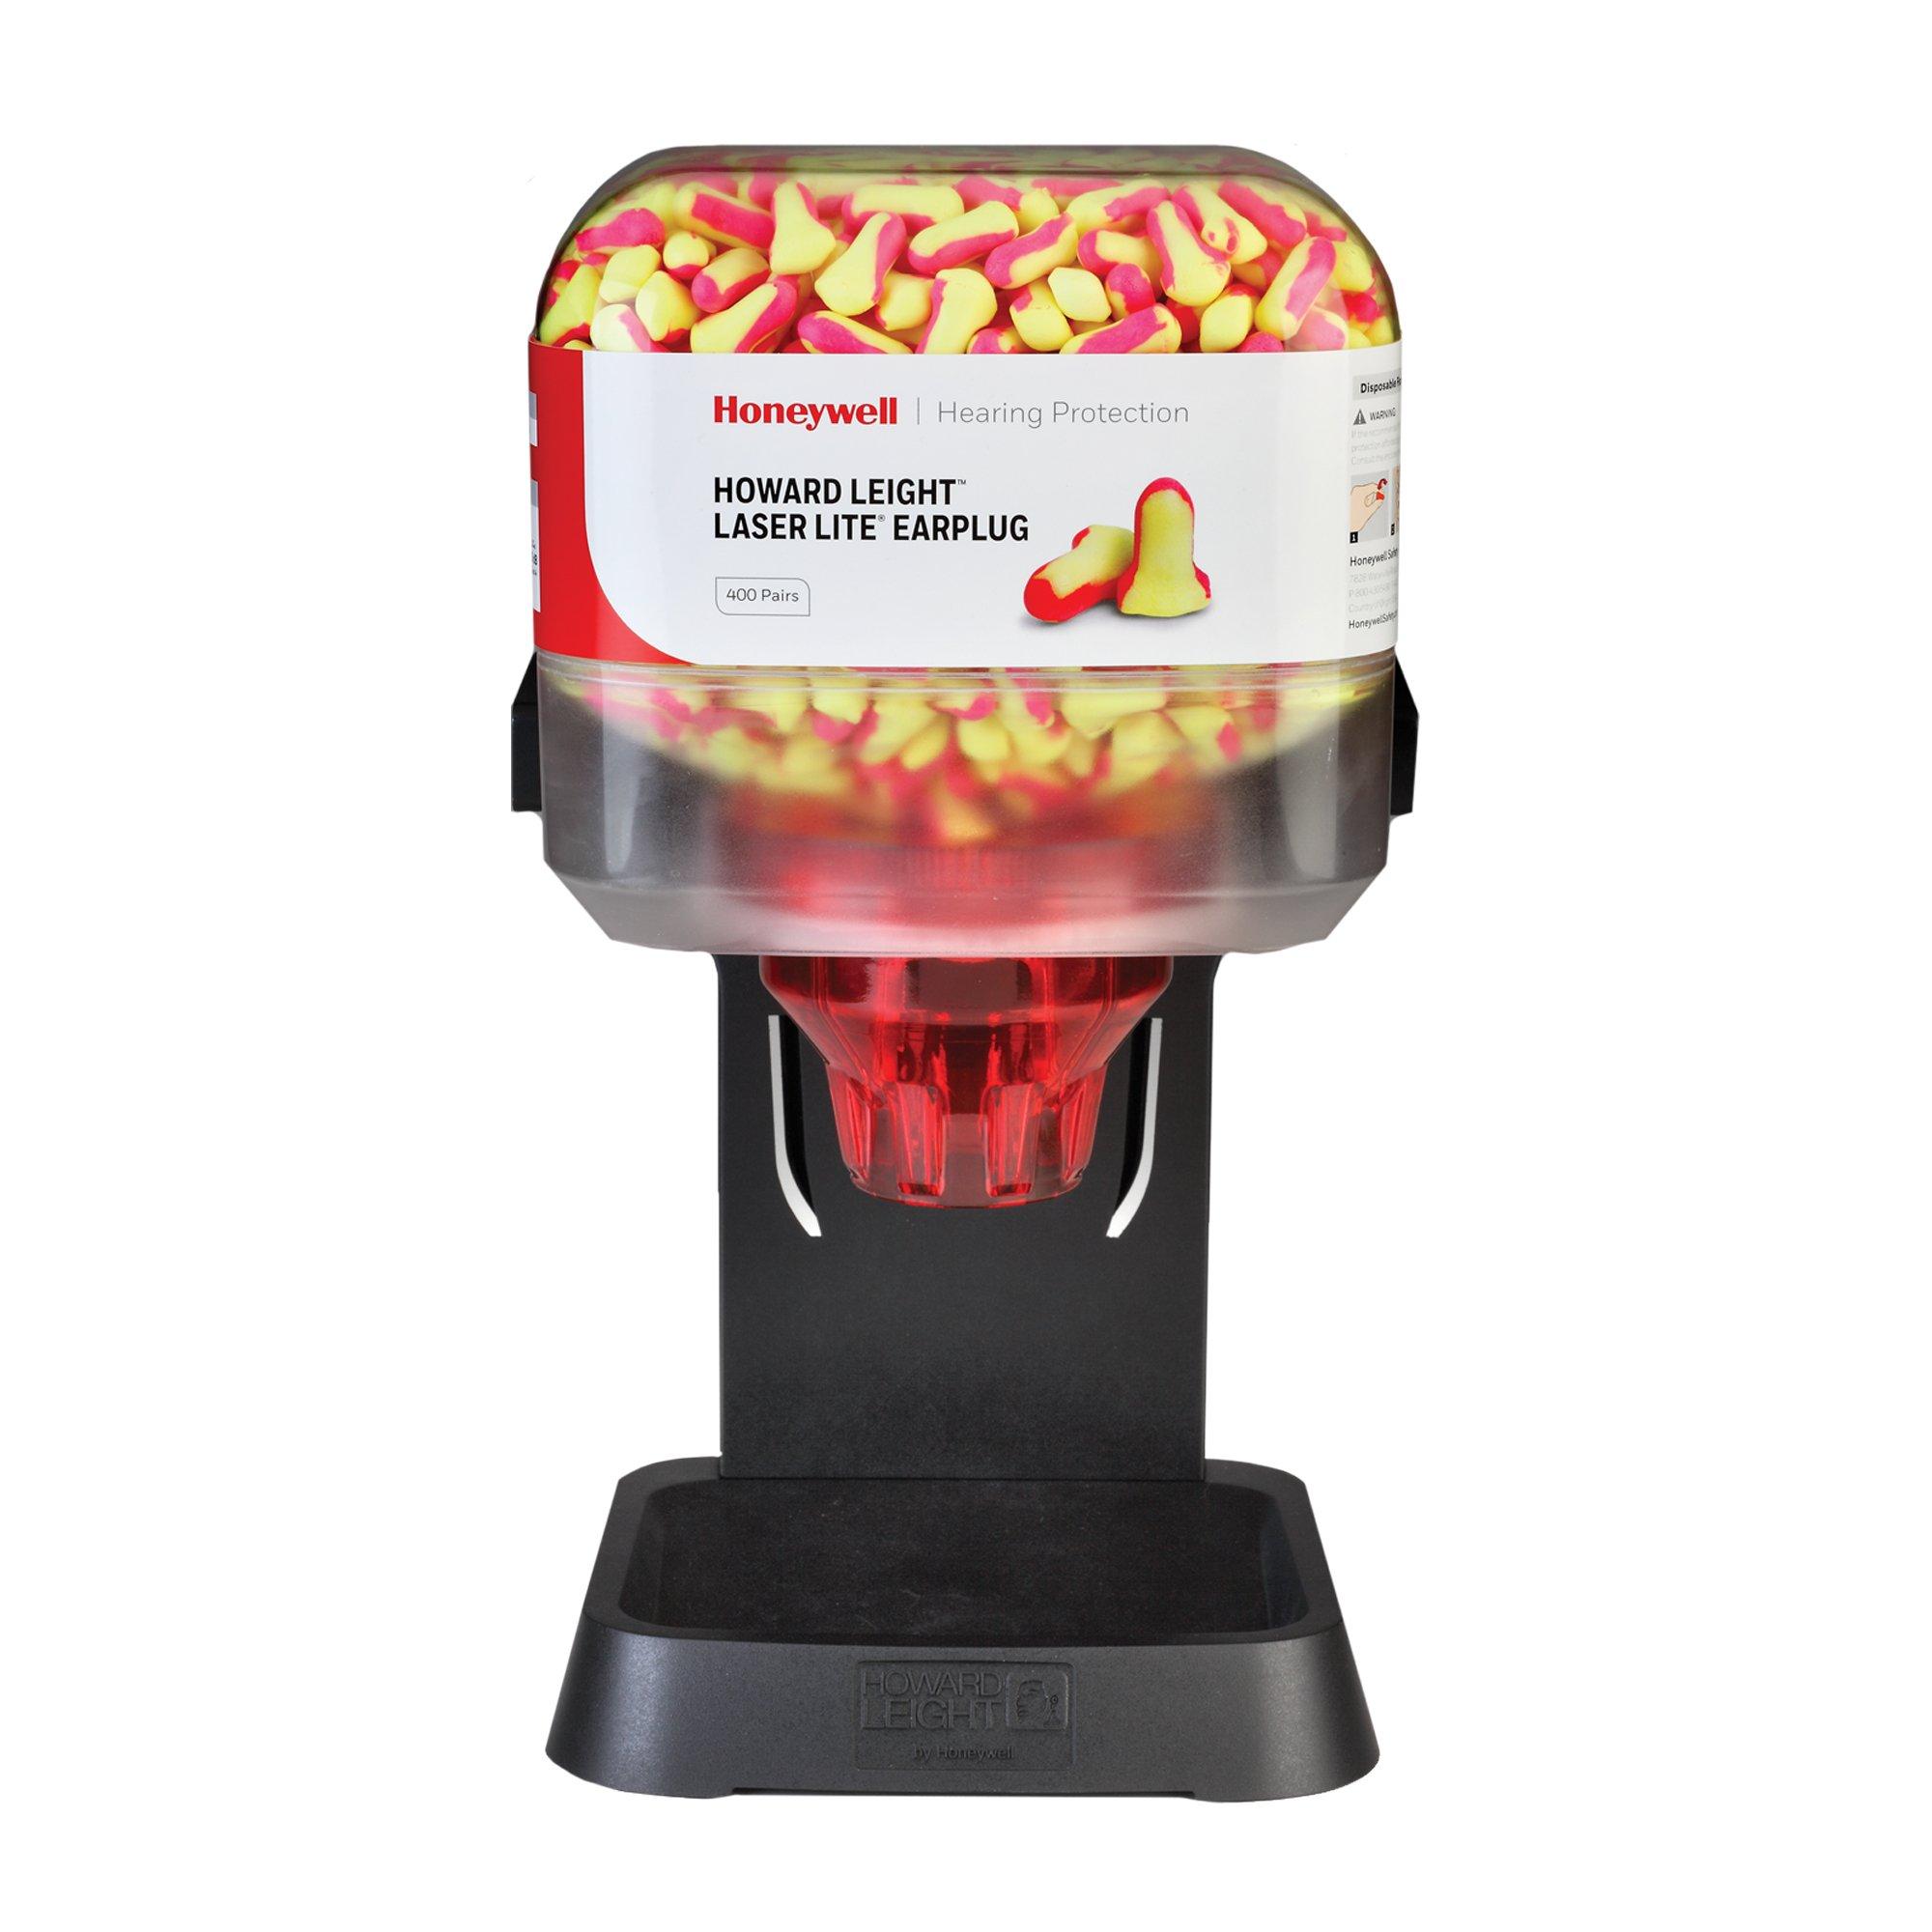 Howard Leight HL400 Earplug Dispenser with 400 Pairs of Laser Lite Hi-Visibility Earplugs